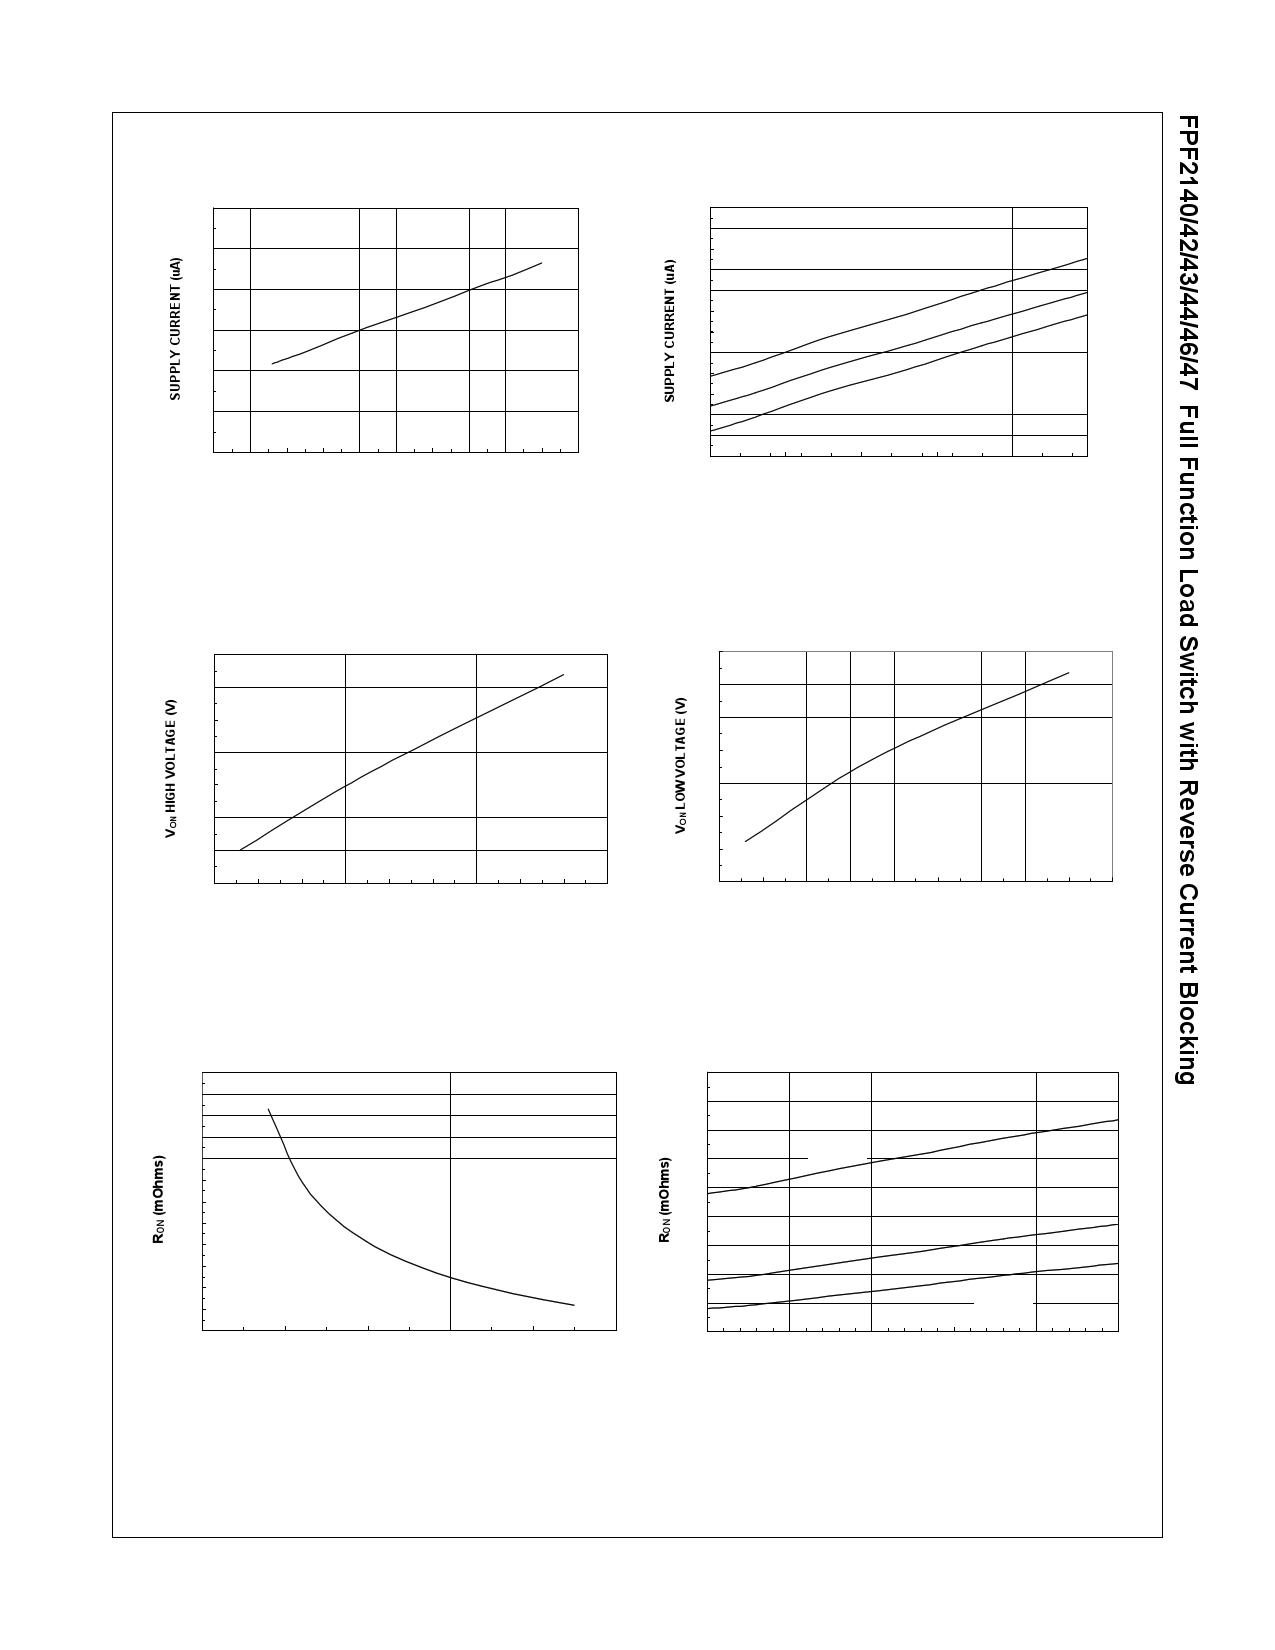 FPF2143 pdf, arduino